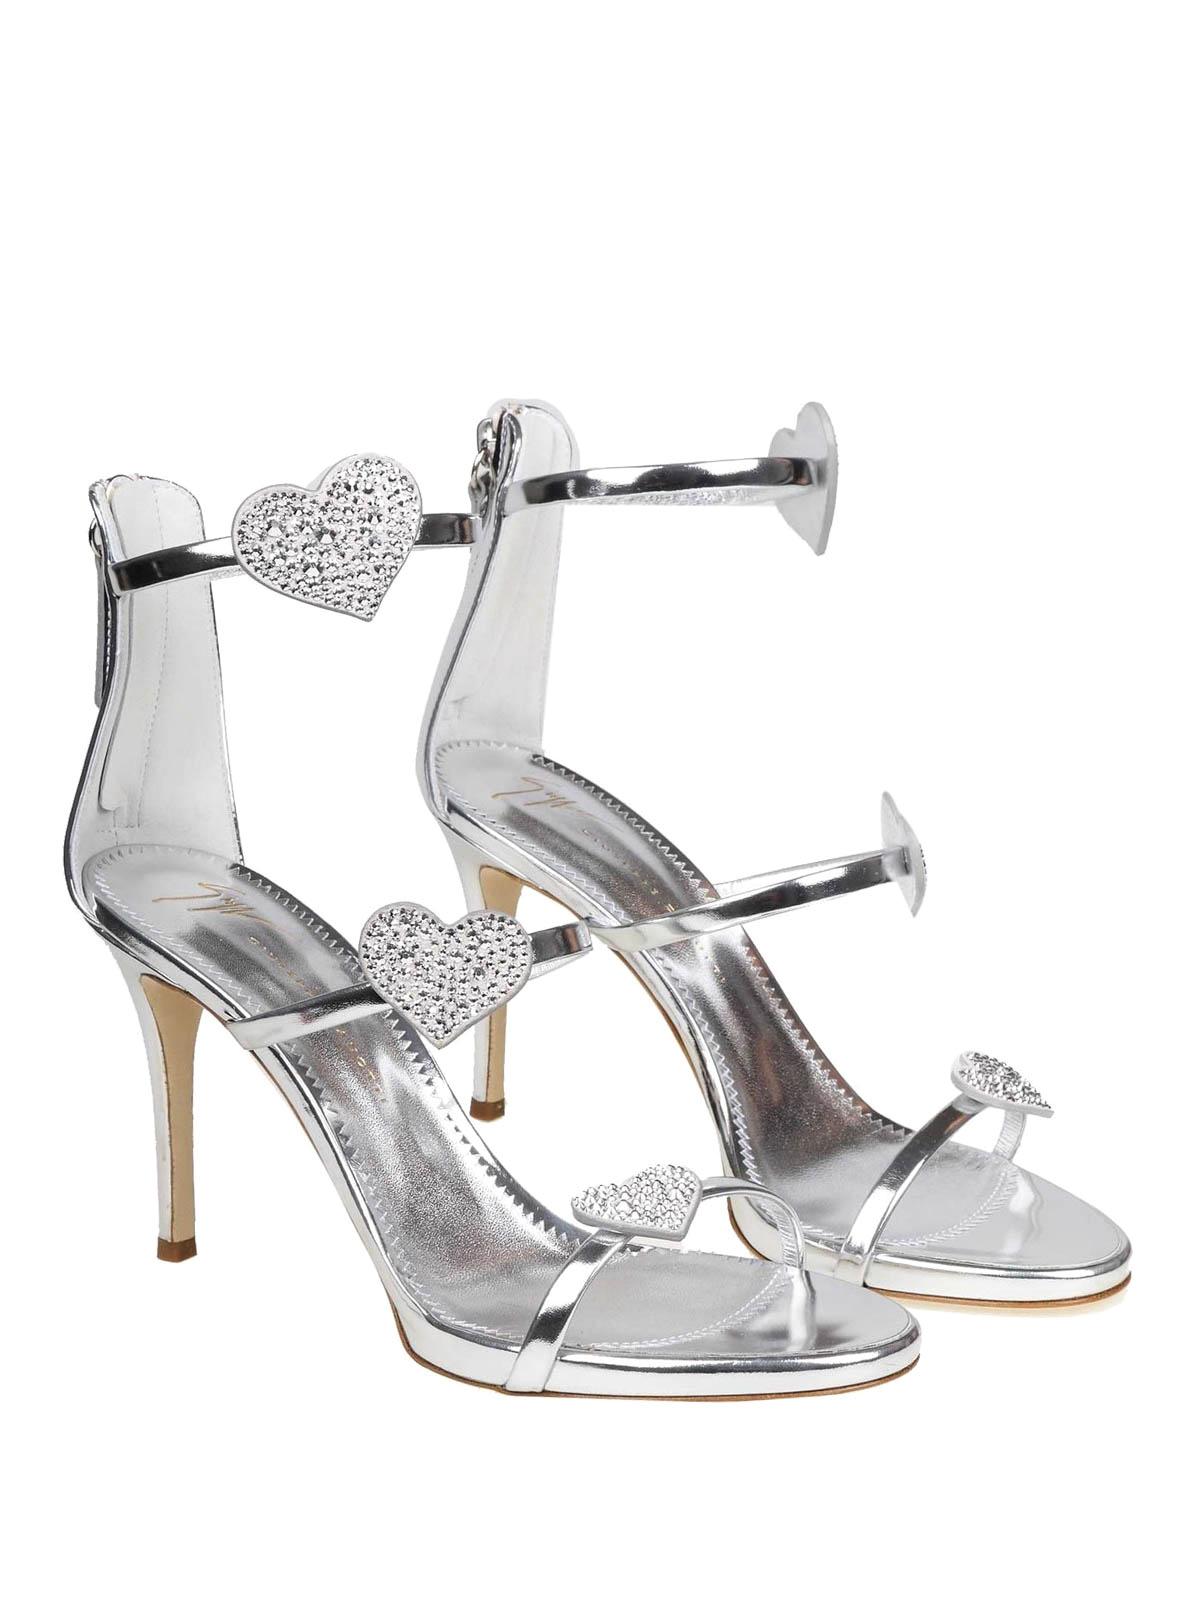 078d89fb4 GIUSEPPE ZANOTTI  sandals online - Harmony Love mirror leather sandals